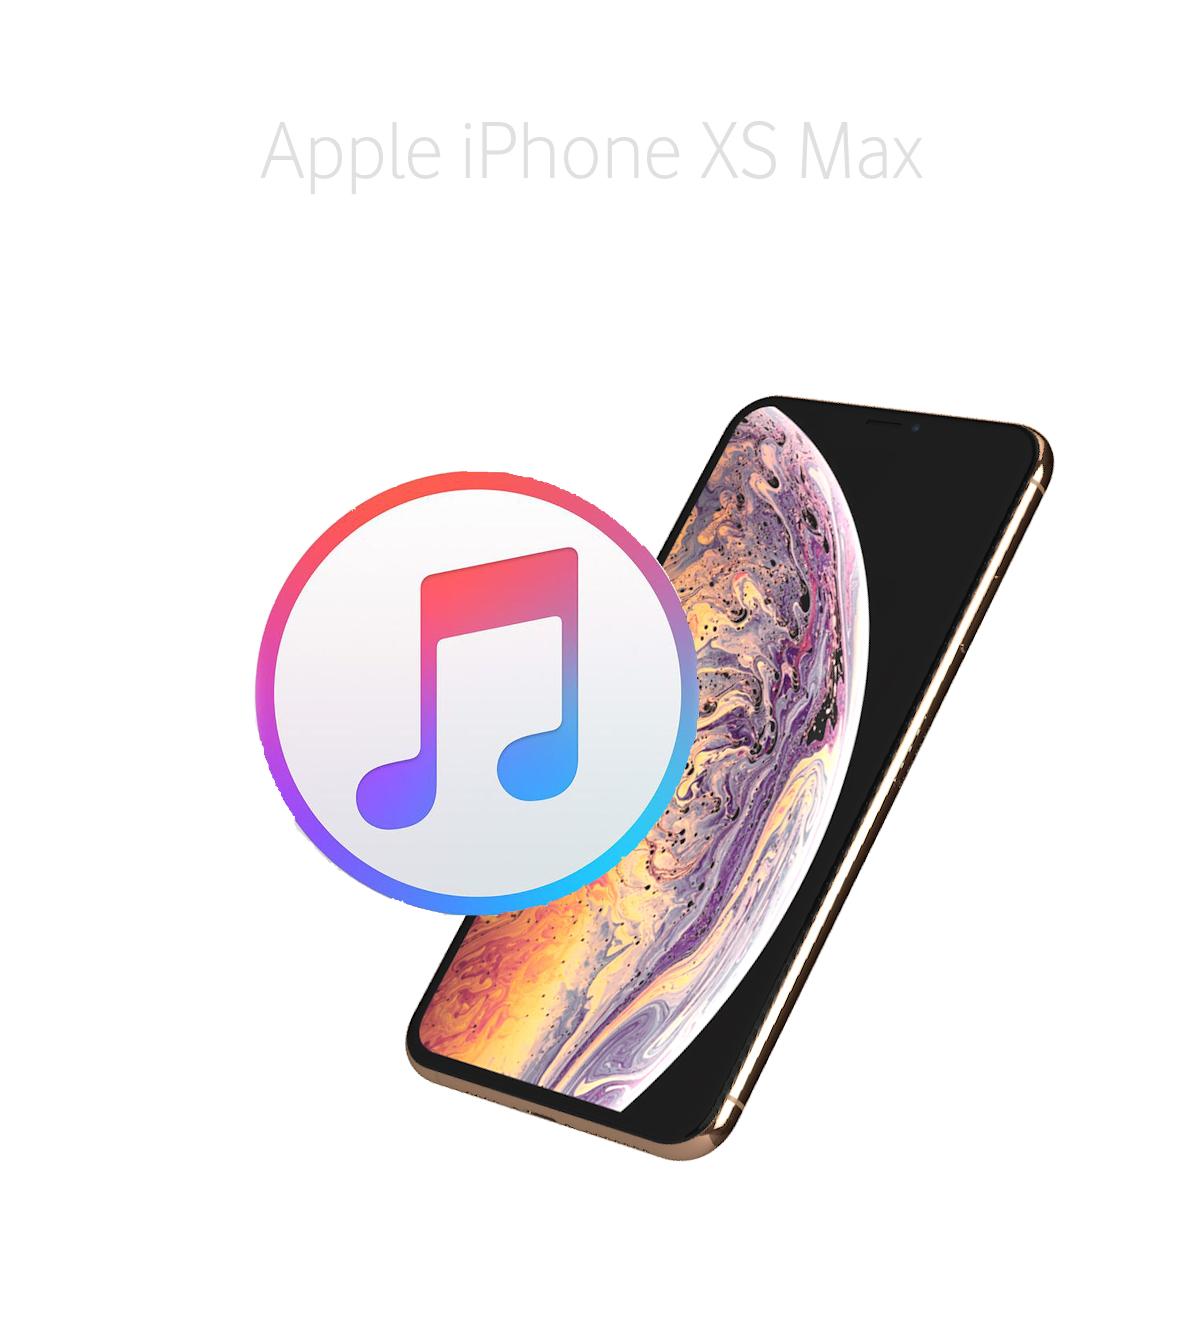 Mjukvara/Återställa iPhone Xs Max